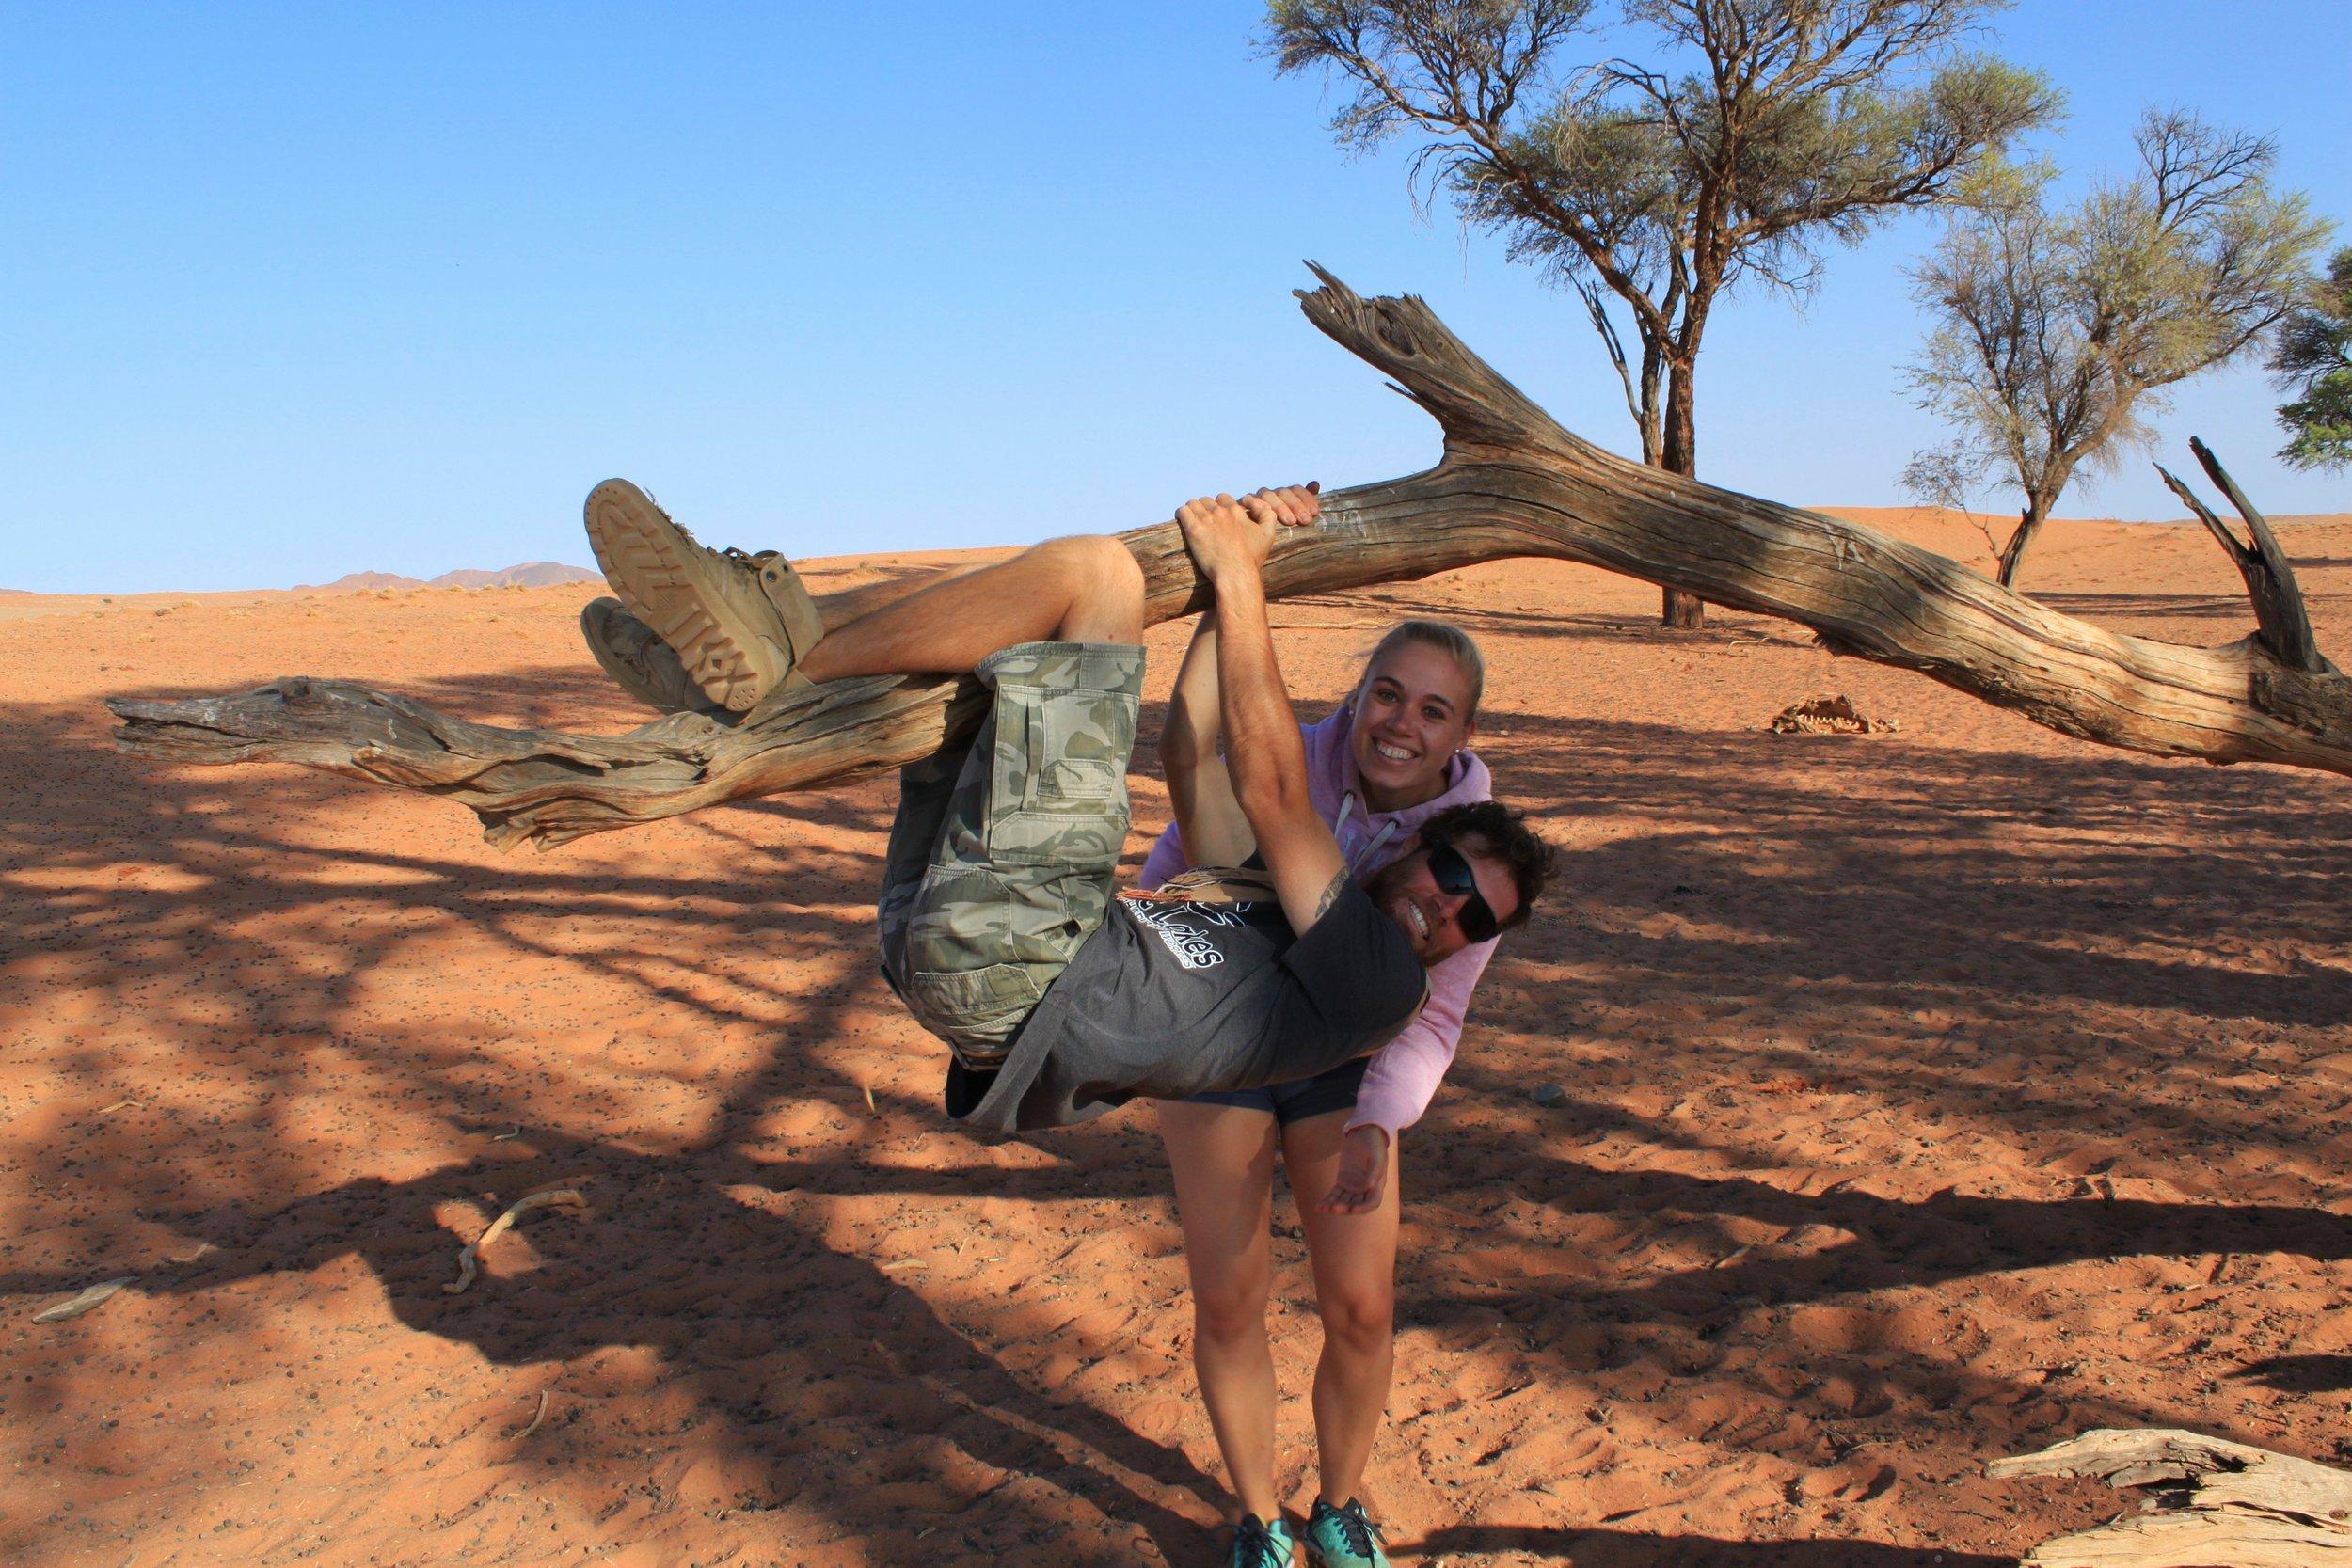 Namibia-Sand-Wüste-2Personen.JPG